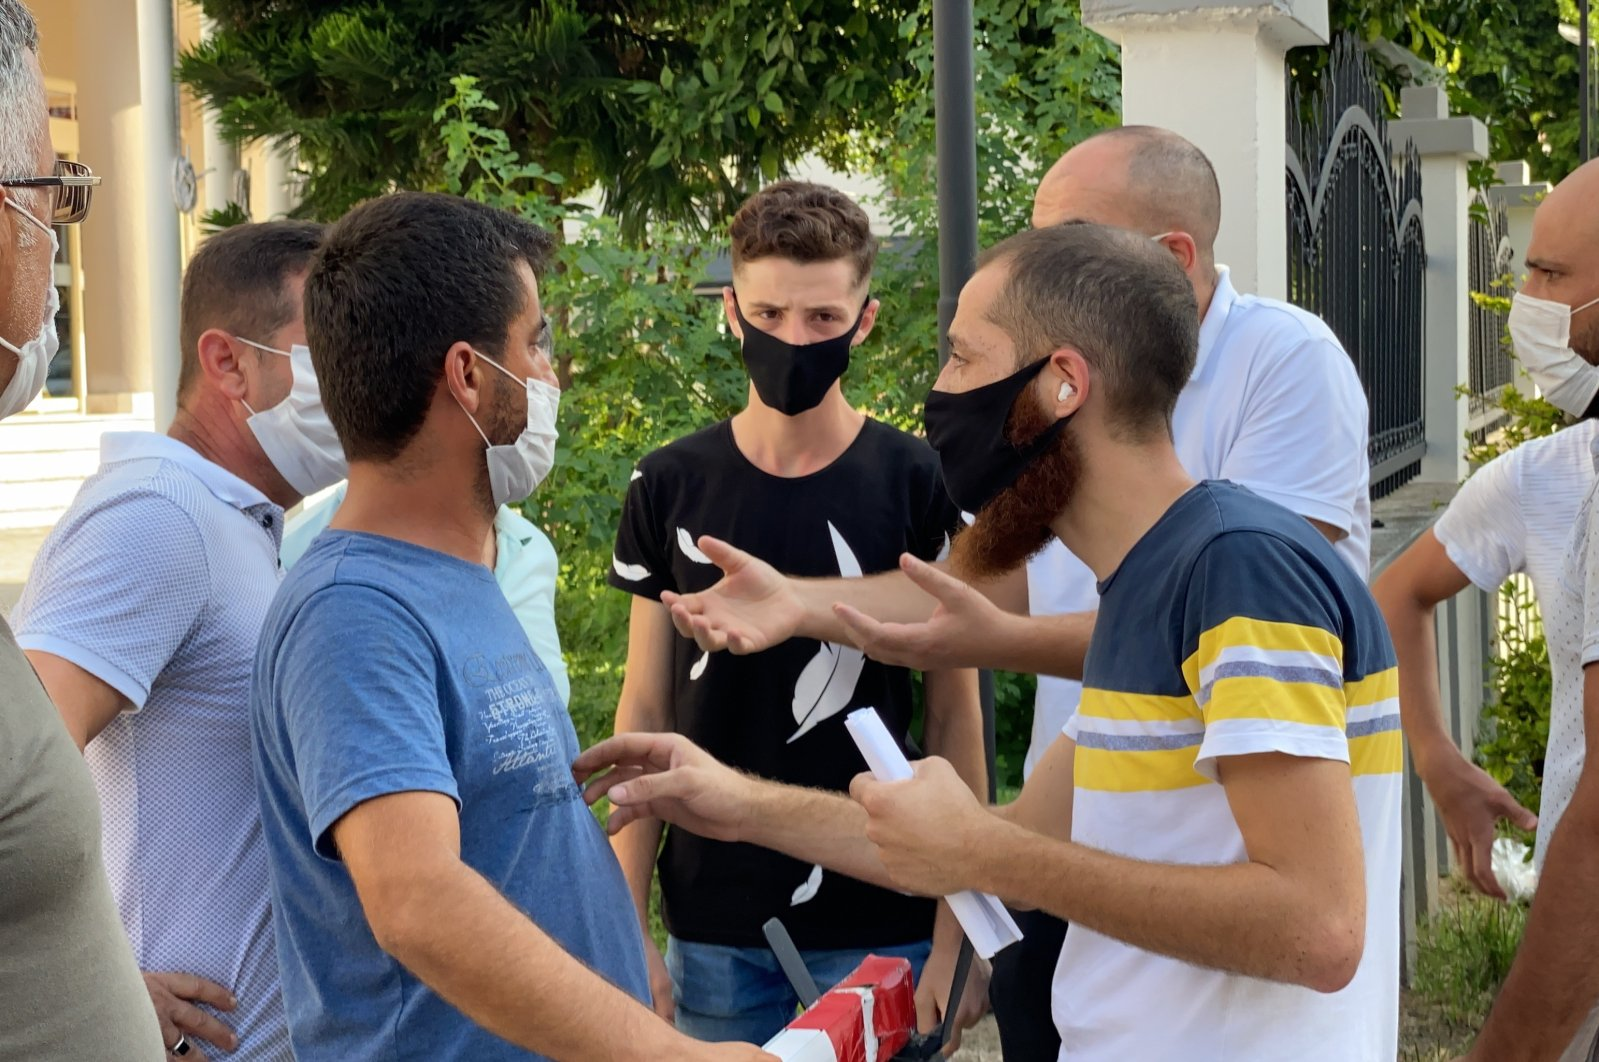 Members of Şahin and Burka families argue near the hospital in Hatay, Turkey, Aug. 9, 2020. (IHA Photo)